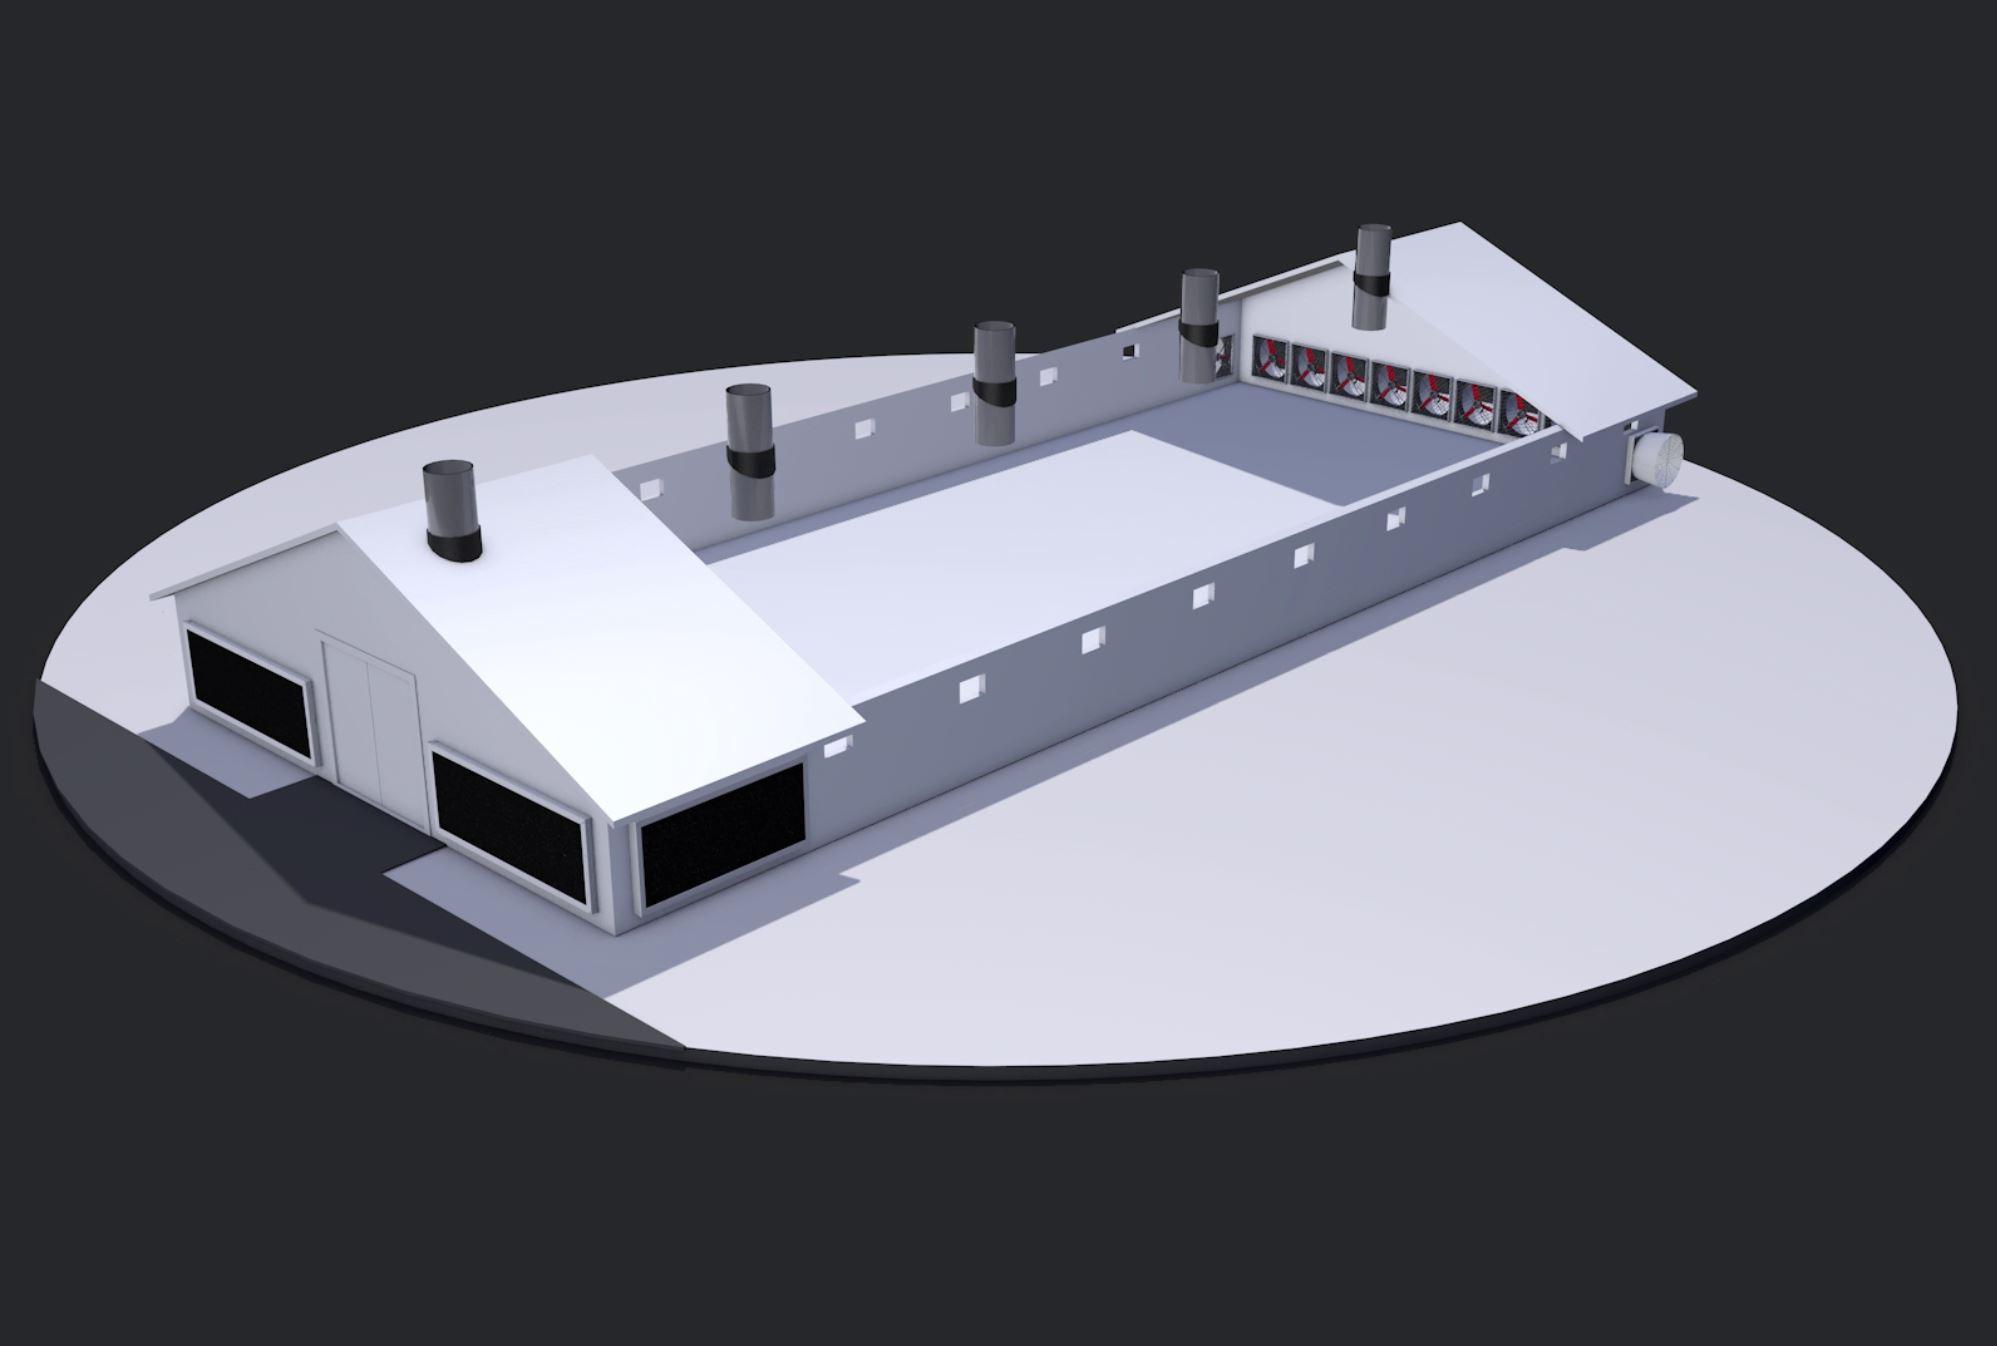 Poultry house ventilation systems Vostermans